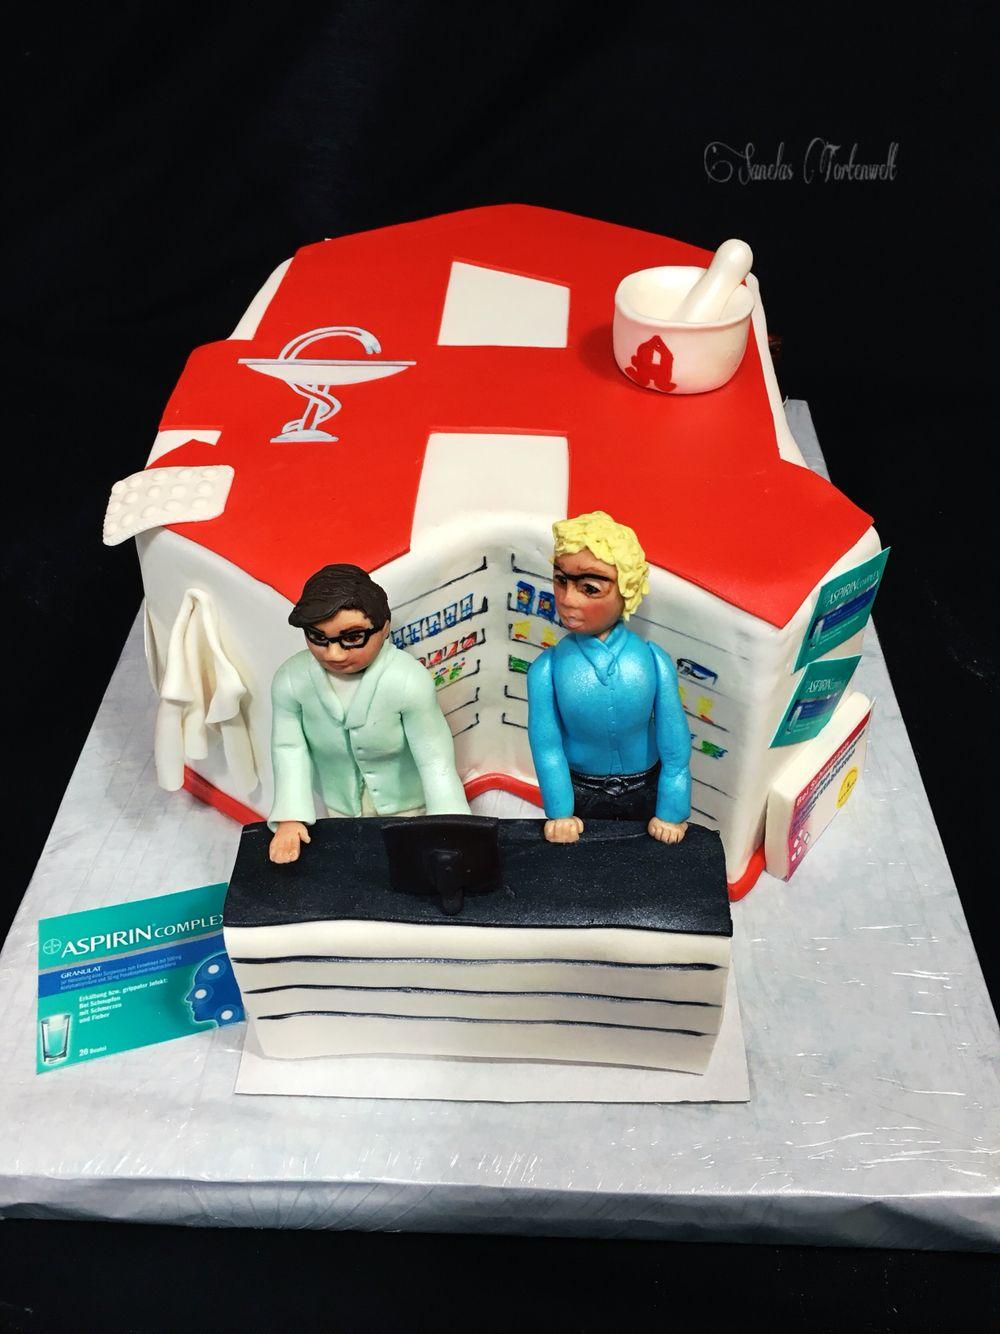 Pharmacy Cake Apotheke Torte Kuchen Backen Torten